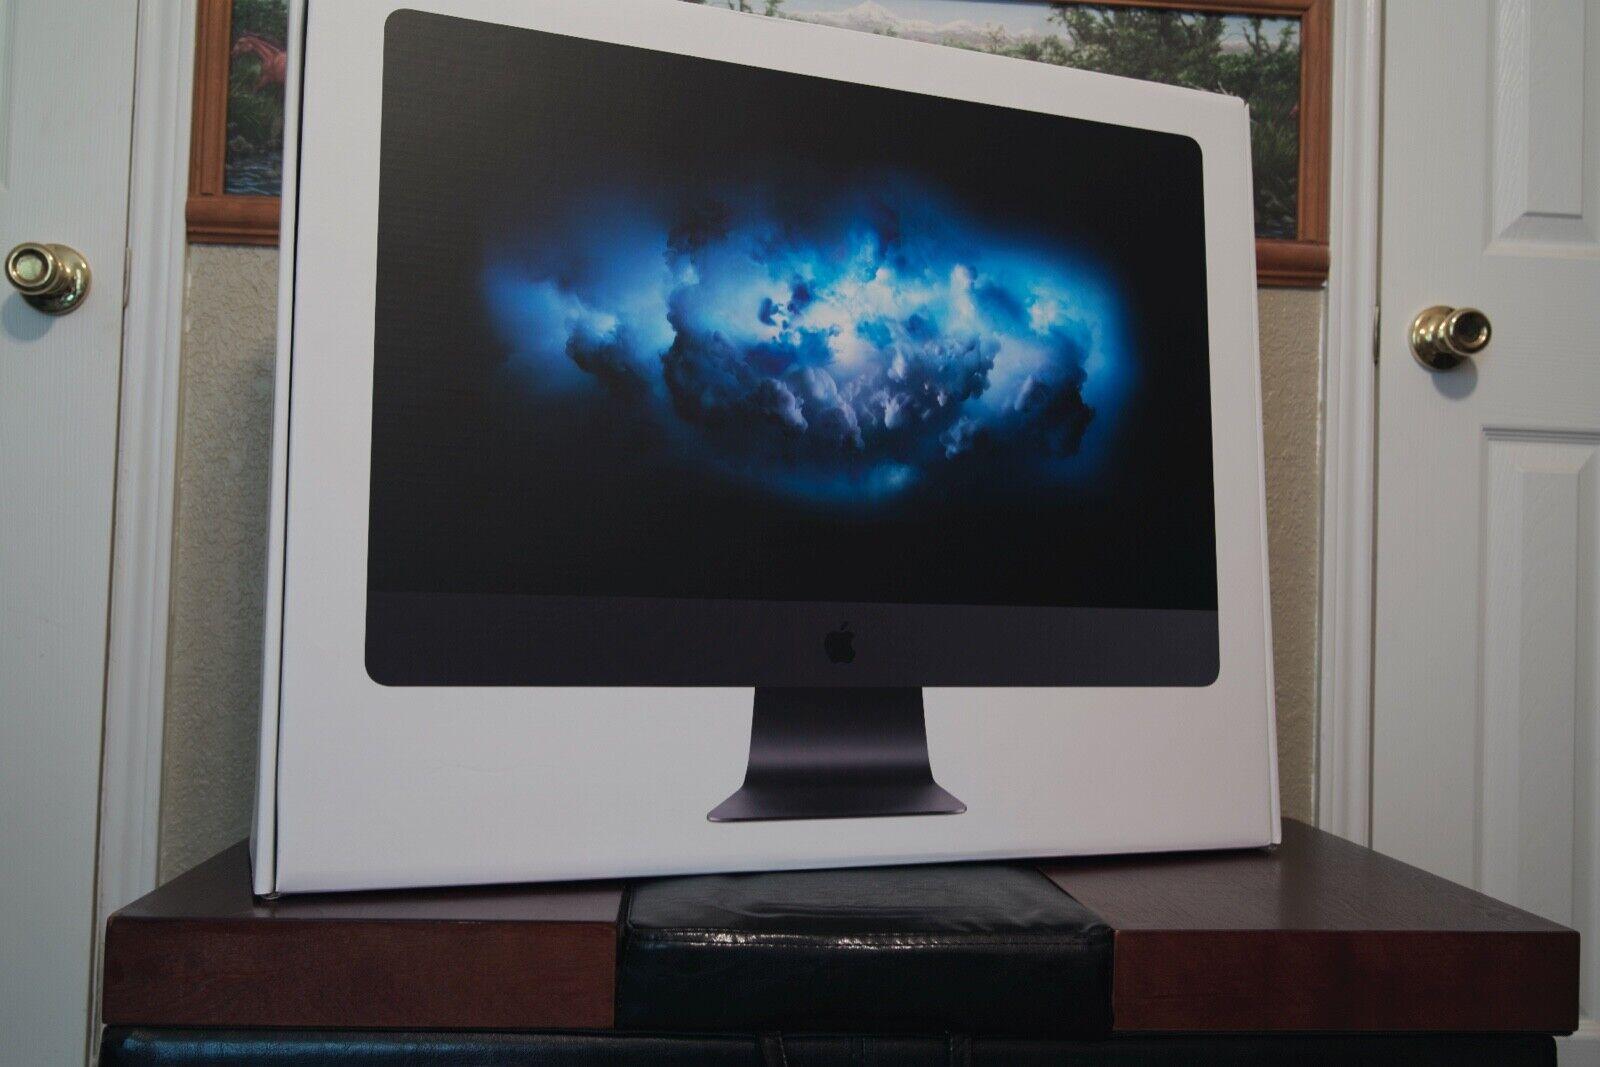 iMac Pro 3GHz 10-core, 64GB Memory, 1TB SSD, Radeon Pro Vega 64 with 16GB HBM2. Buy it now for 4799.00